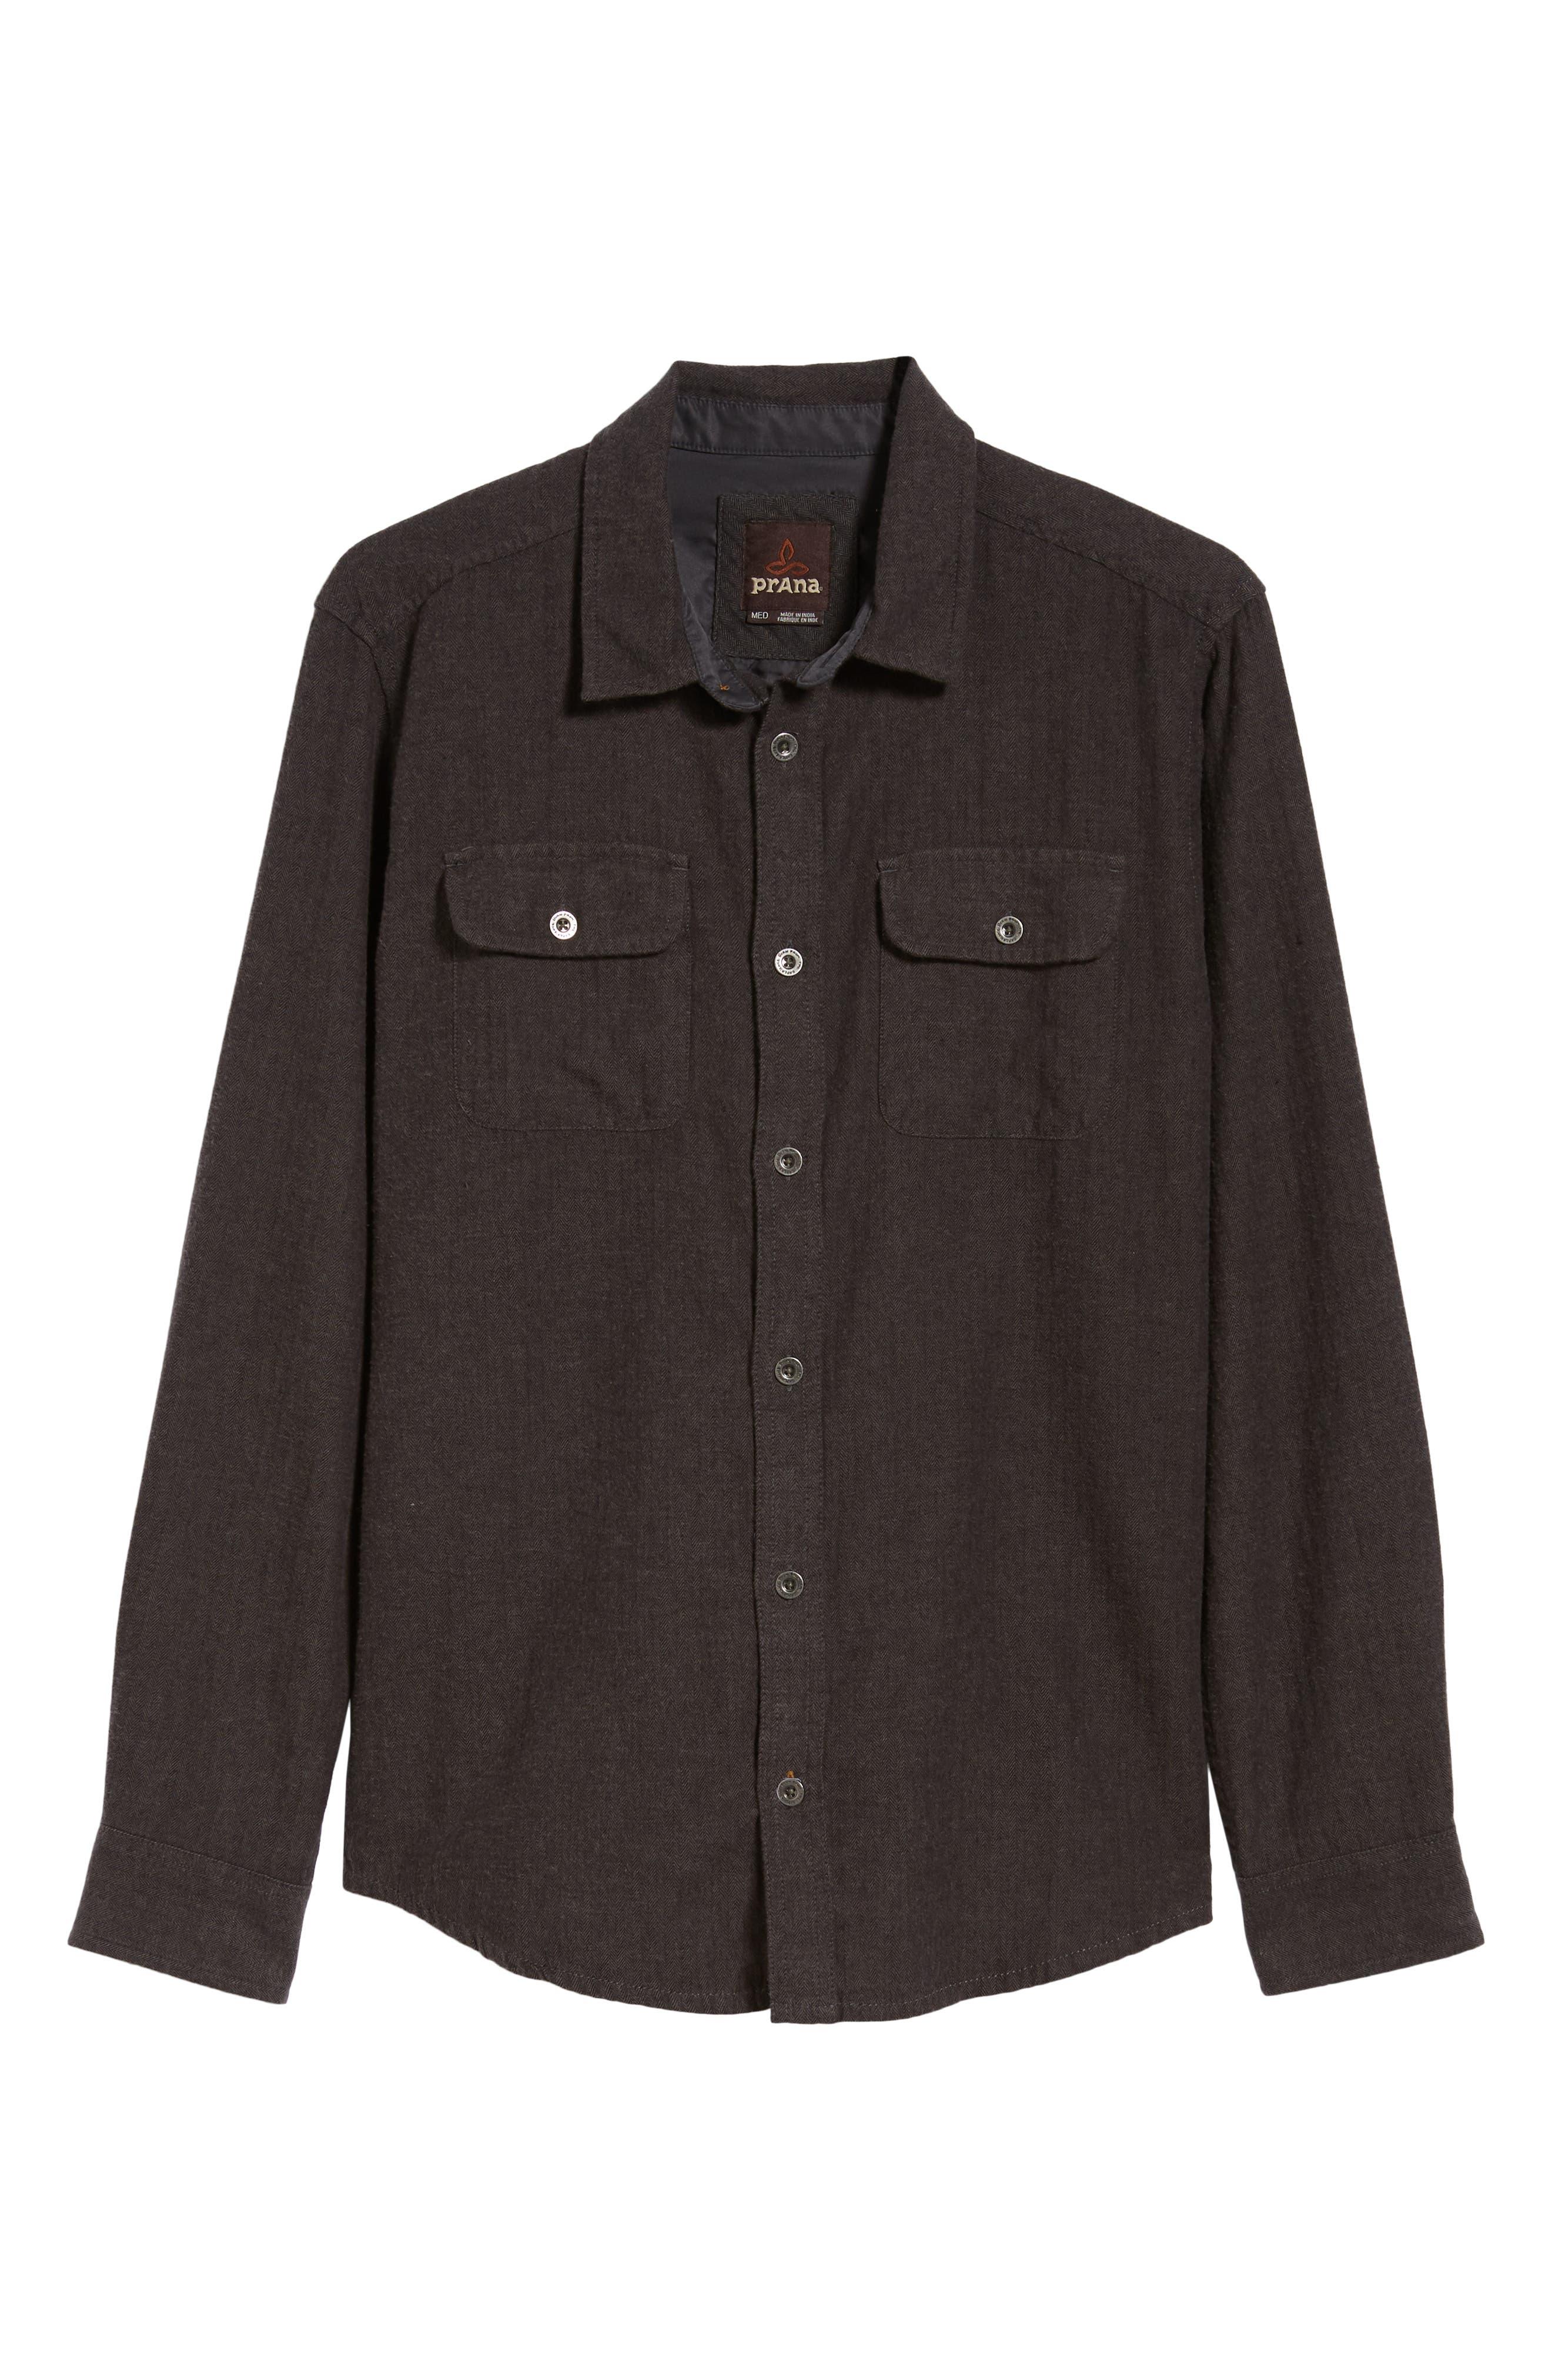 Lybek Regular Fit Herringbone Flannel Shirt,                             Alternate thumbnail 5, color,                             SCORCHED BROWN HERRINGBONE